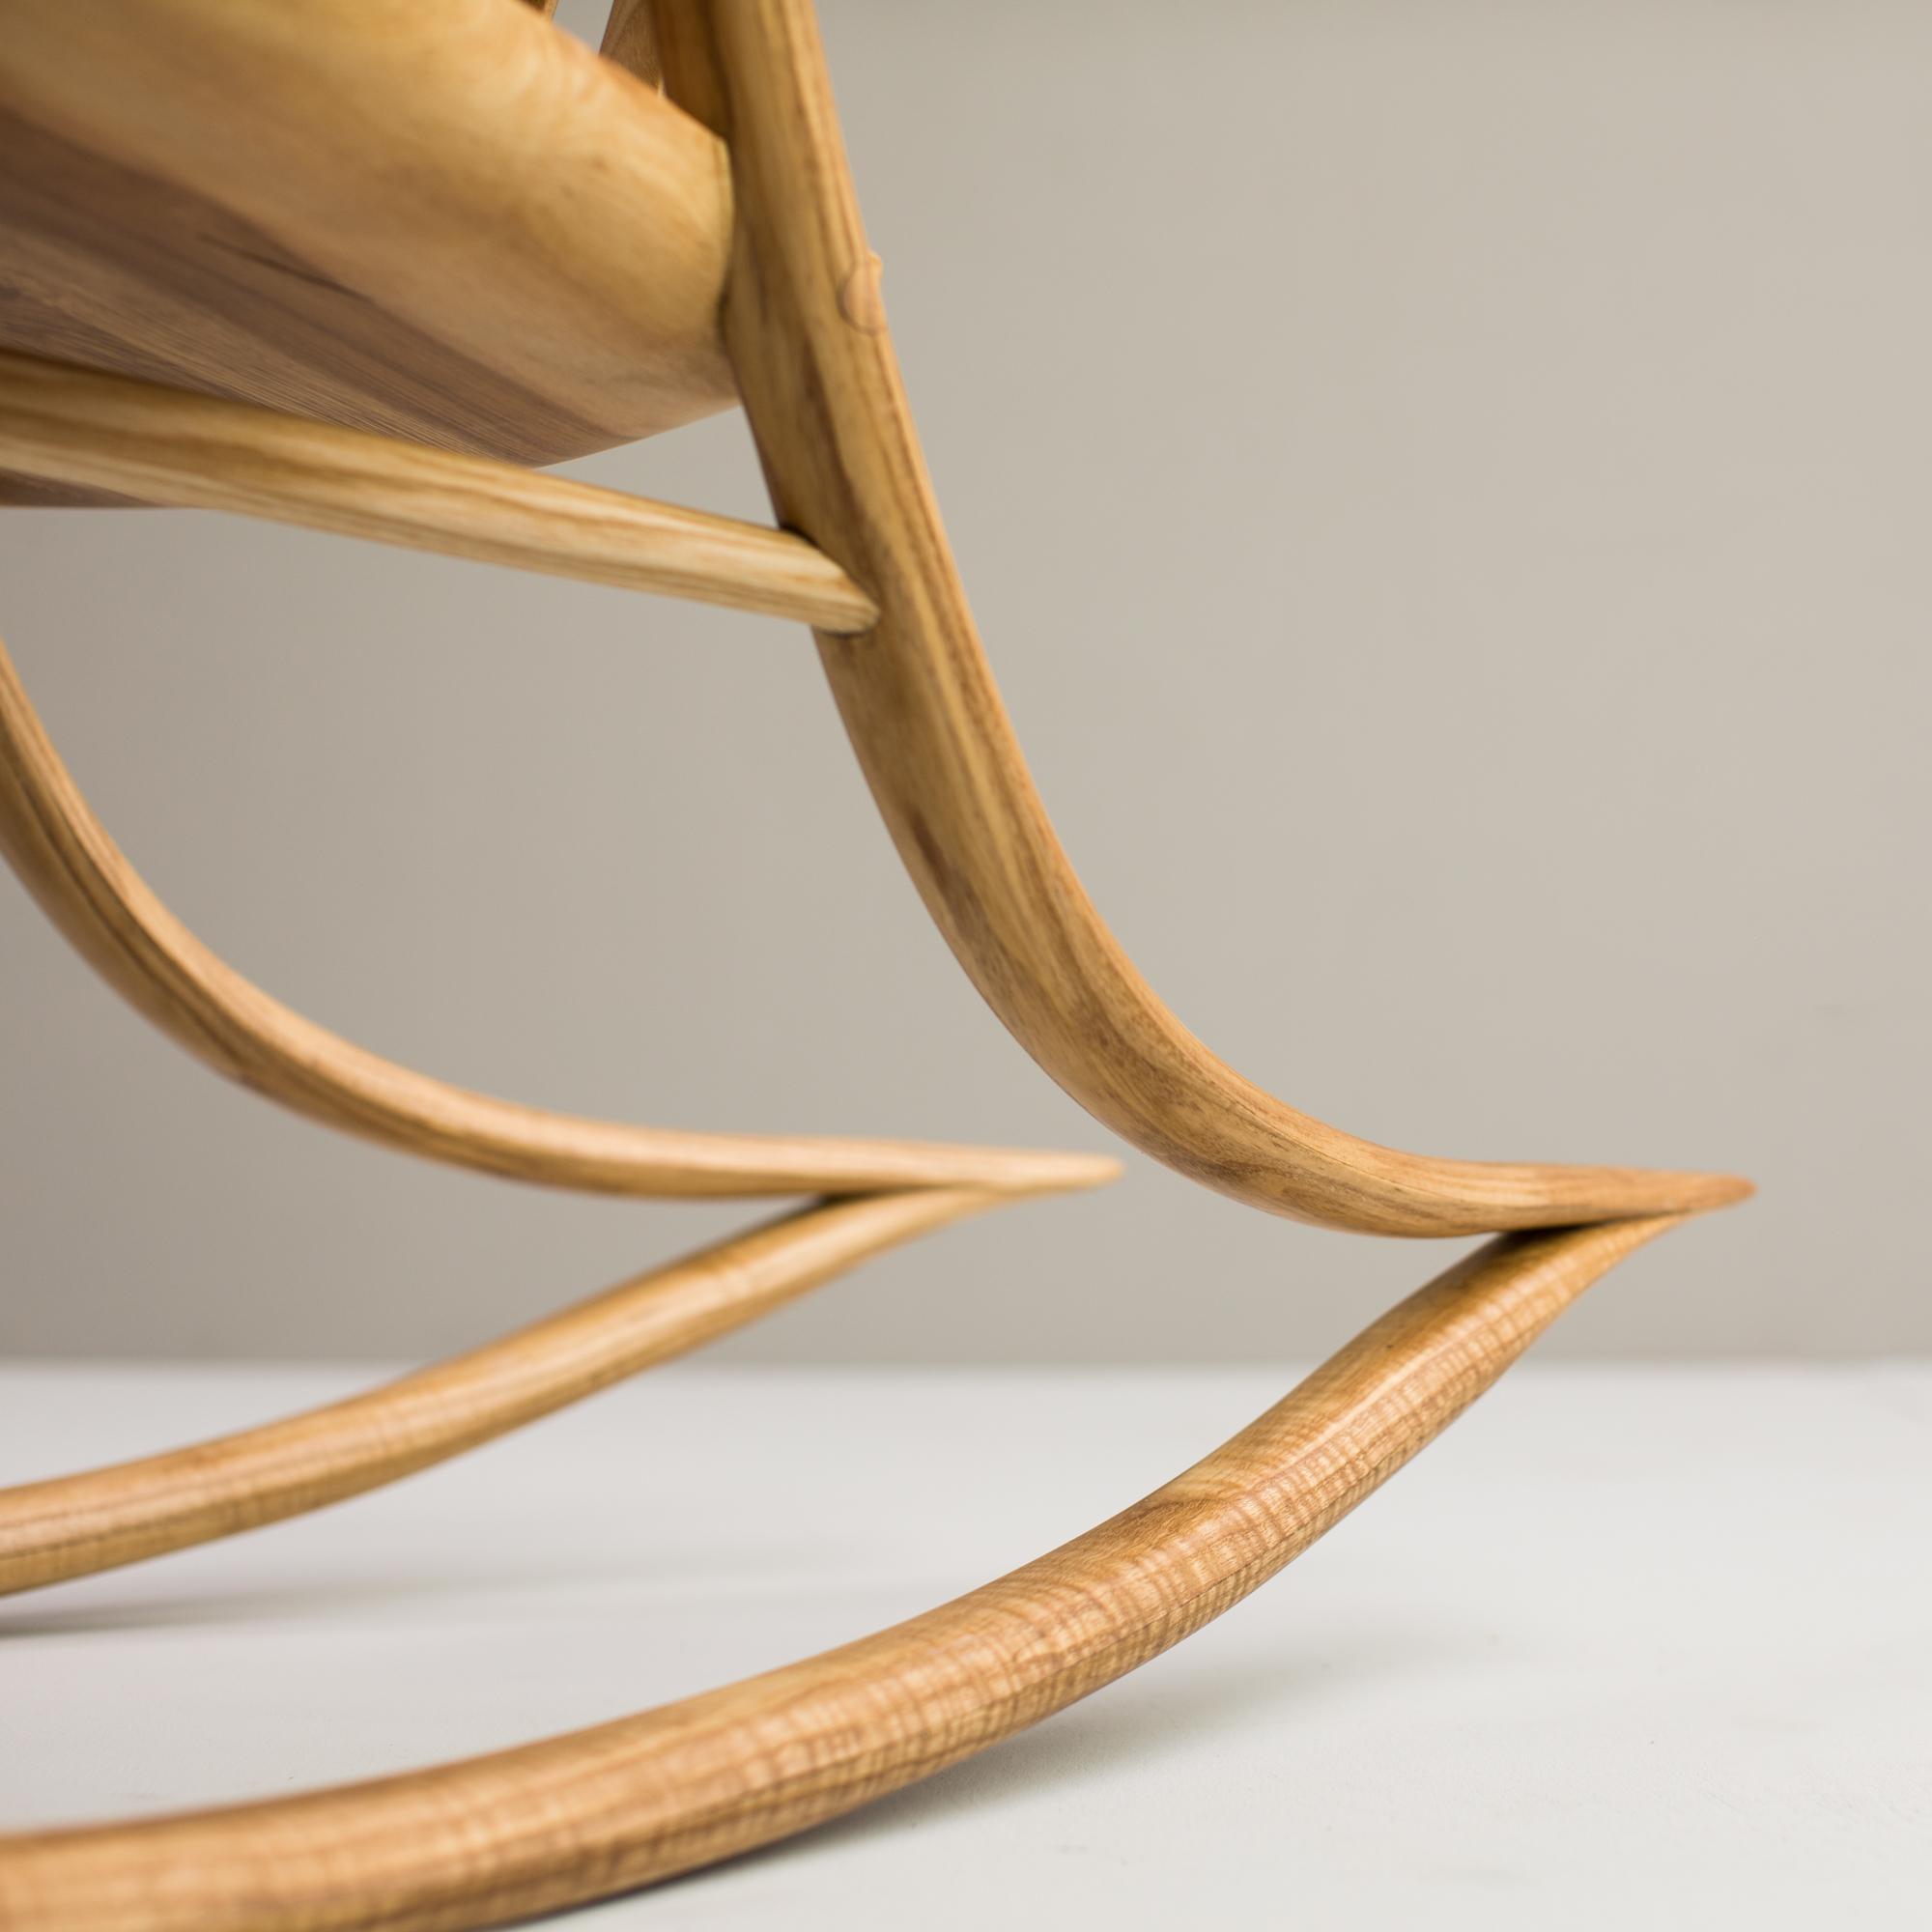 Rocking Chair-9.jpg